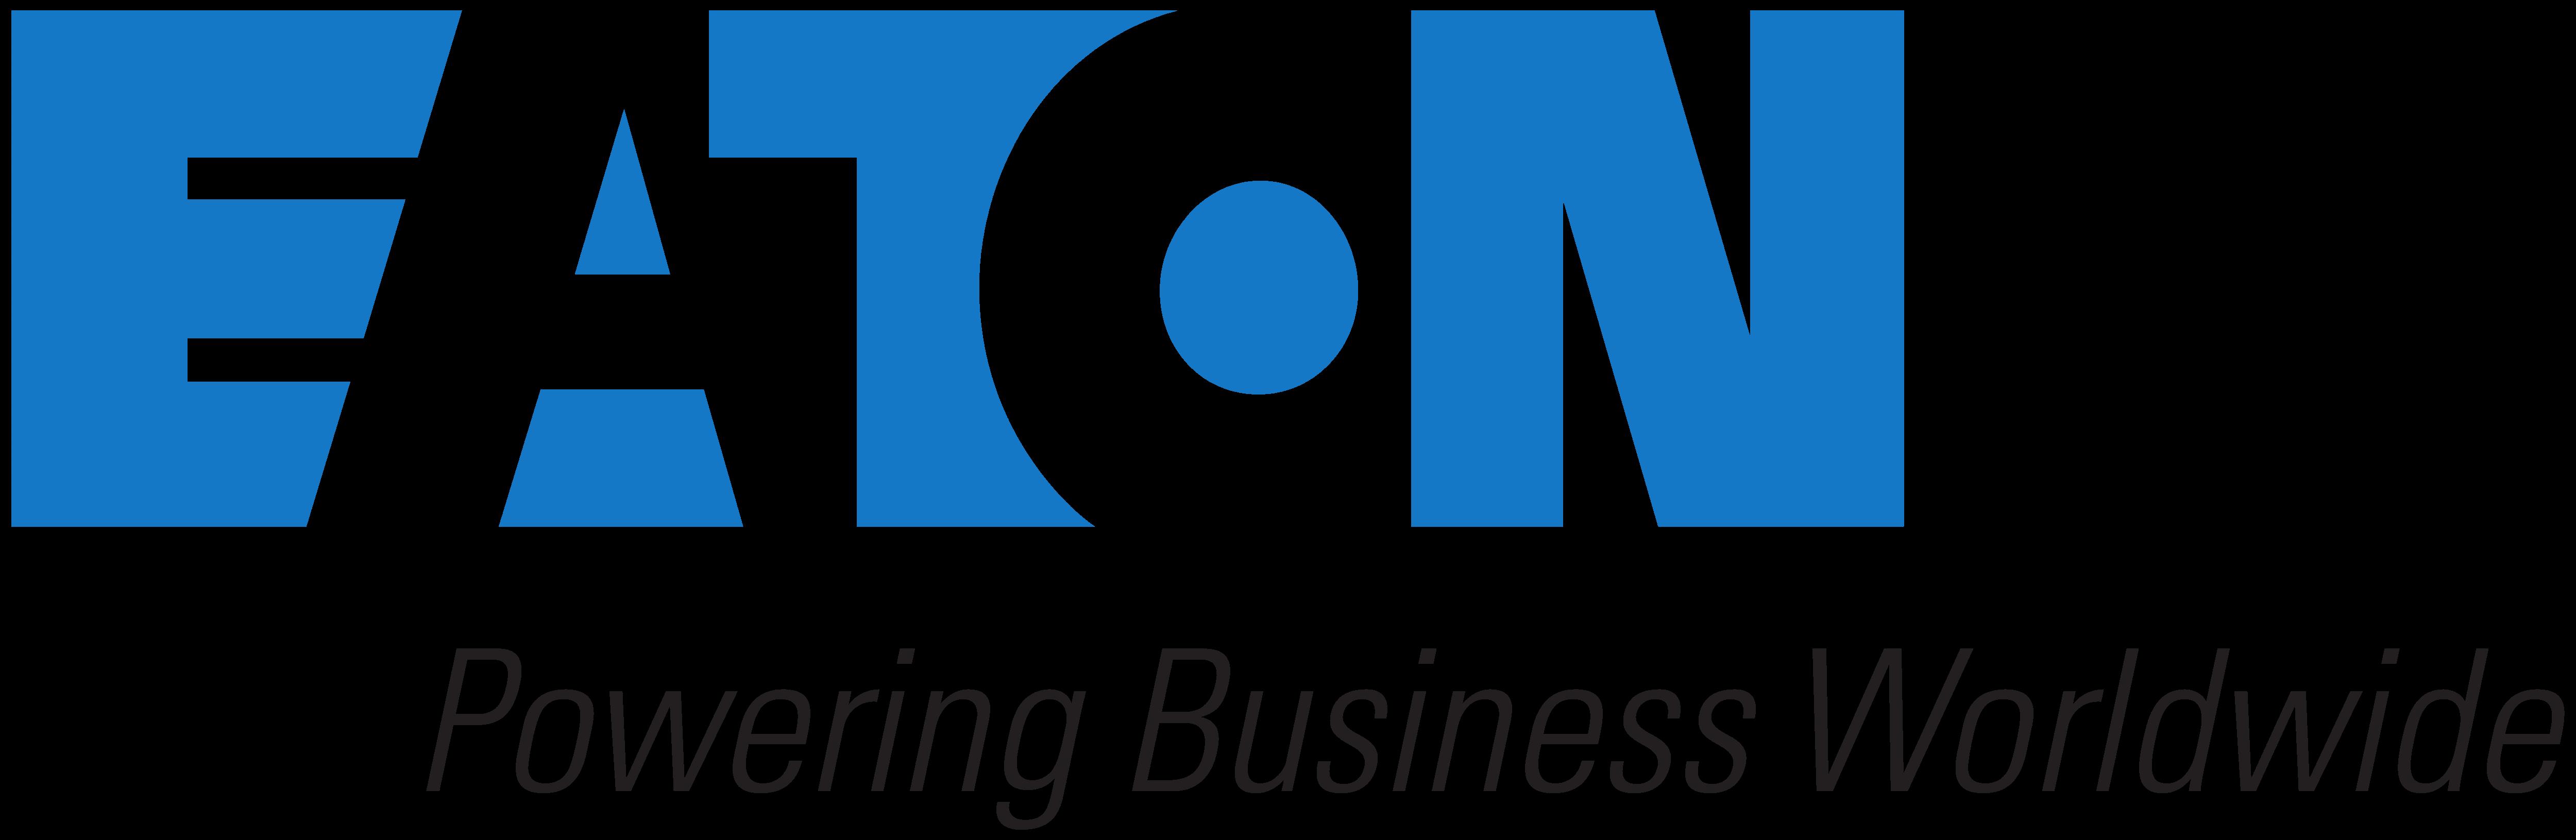 Eaton Corporation logo